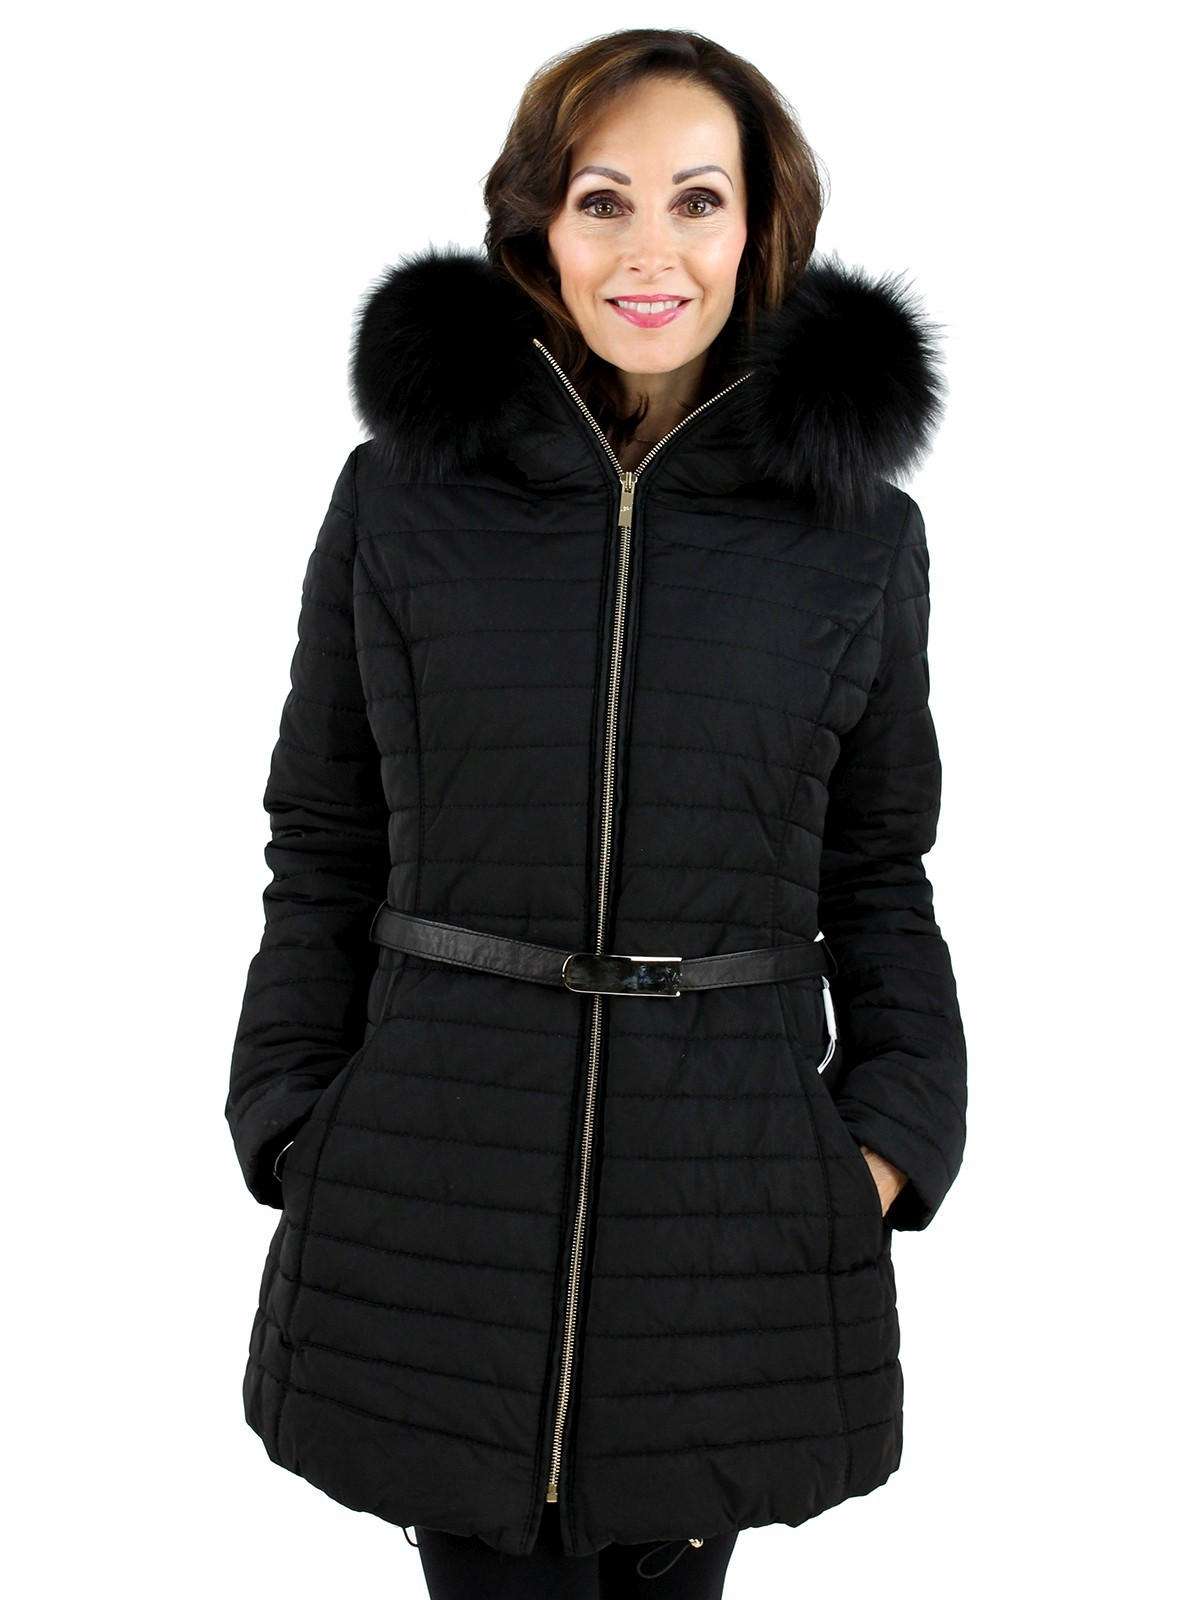 Gorski Woman's  Nero Fabric And Fox Apres-Ski Jacket